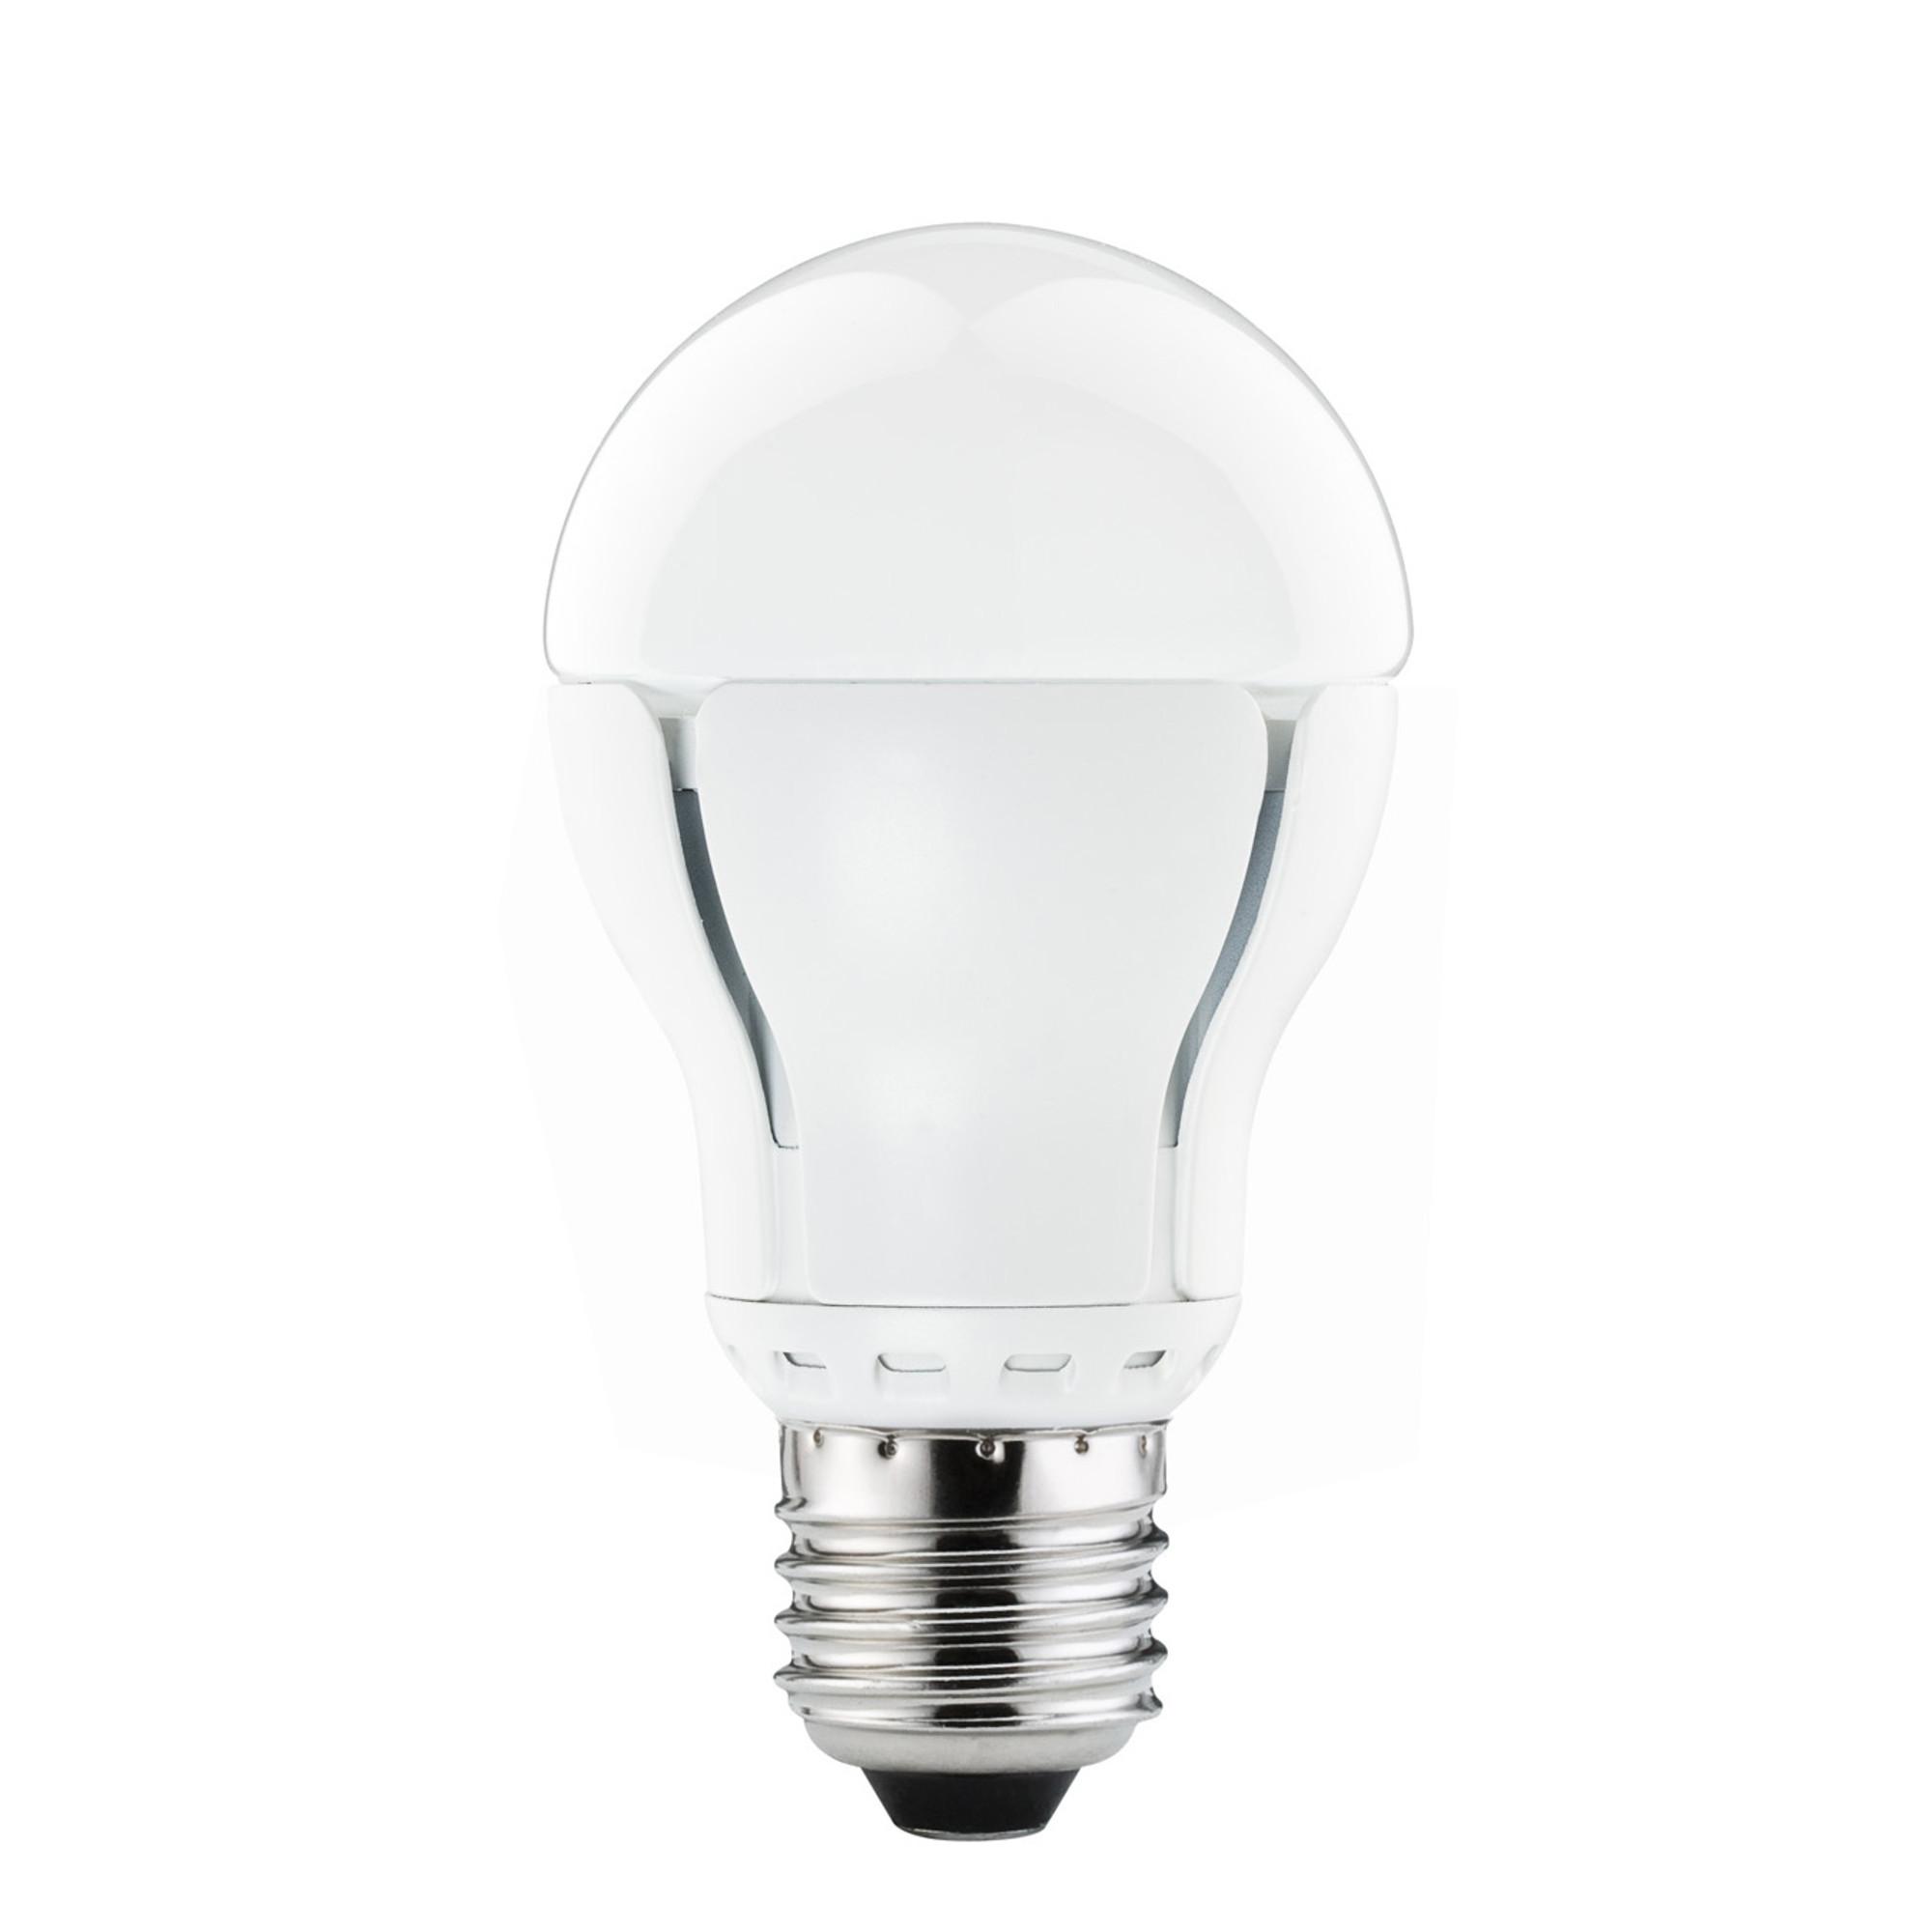 Лампа светодиодная Paulmann 28259 E27 470 Лм теплый свет